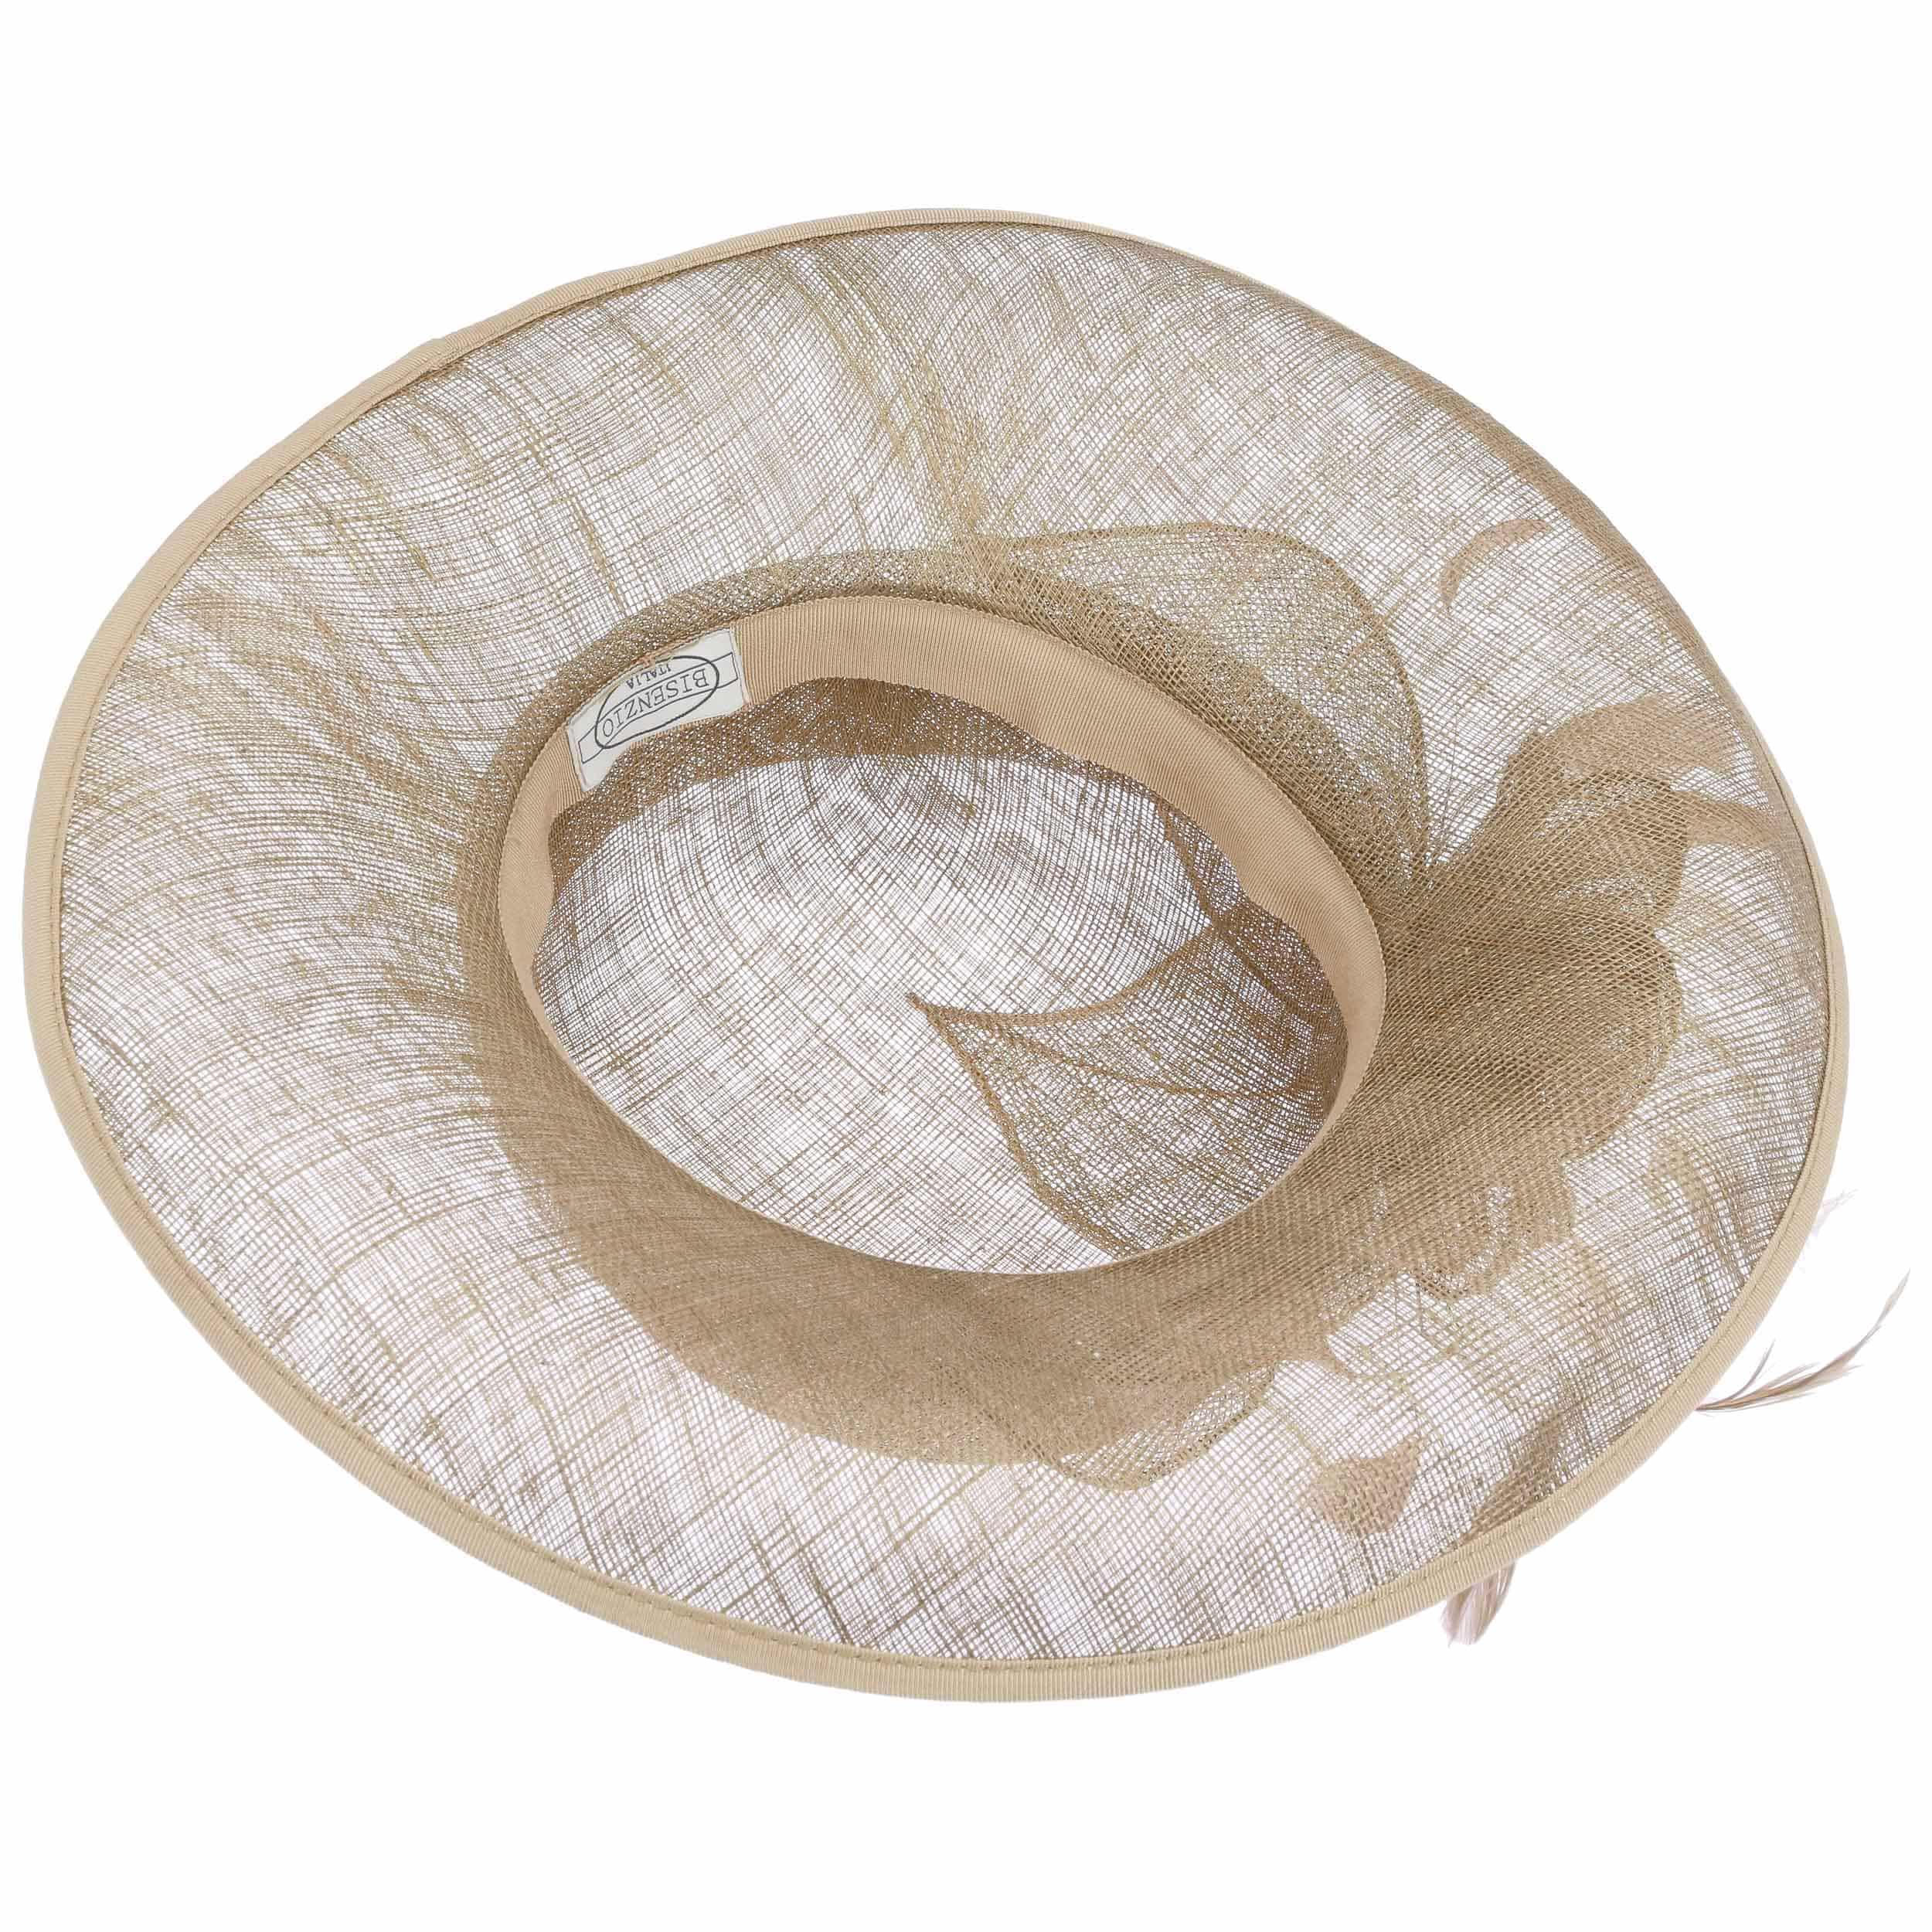 ... Cappello da Donna Clare Sinamay by Lierys - marrone 2 ... d540ebd660b5